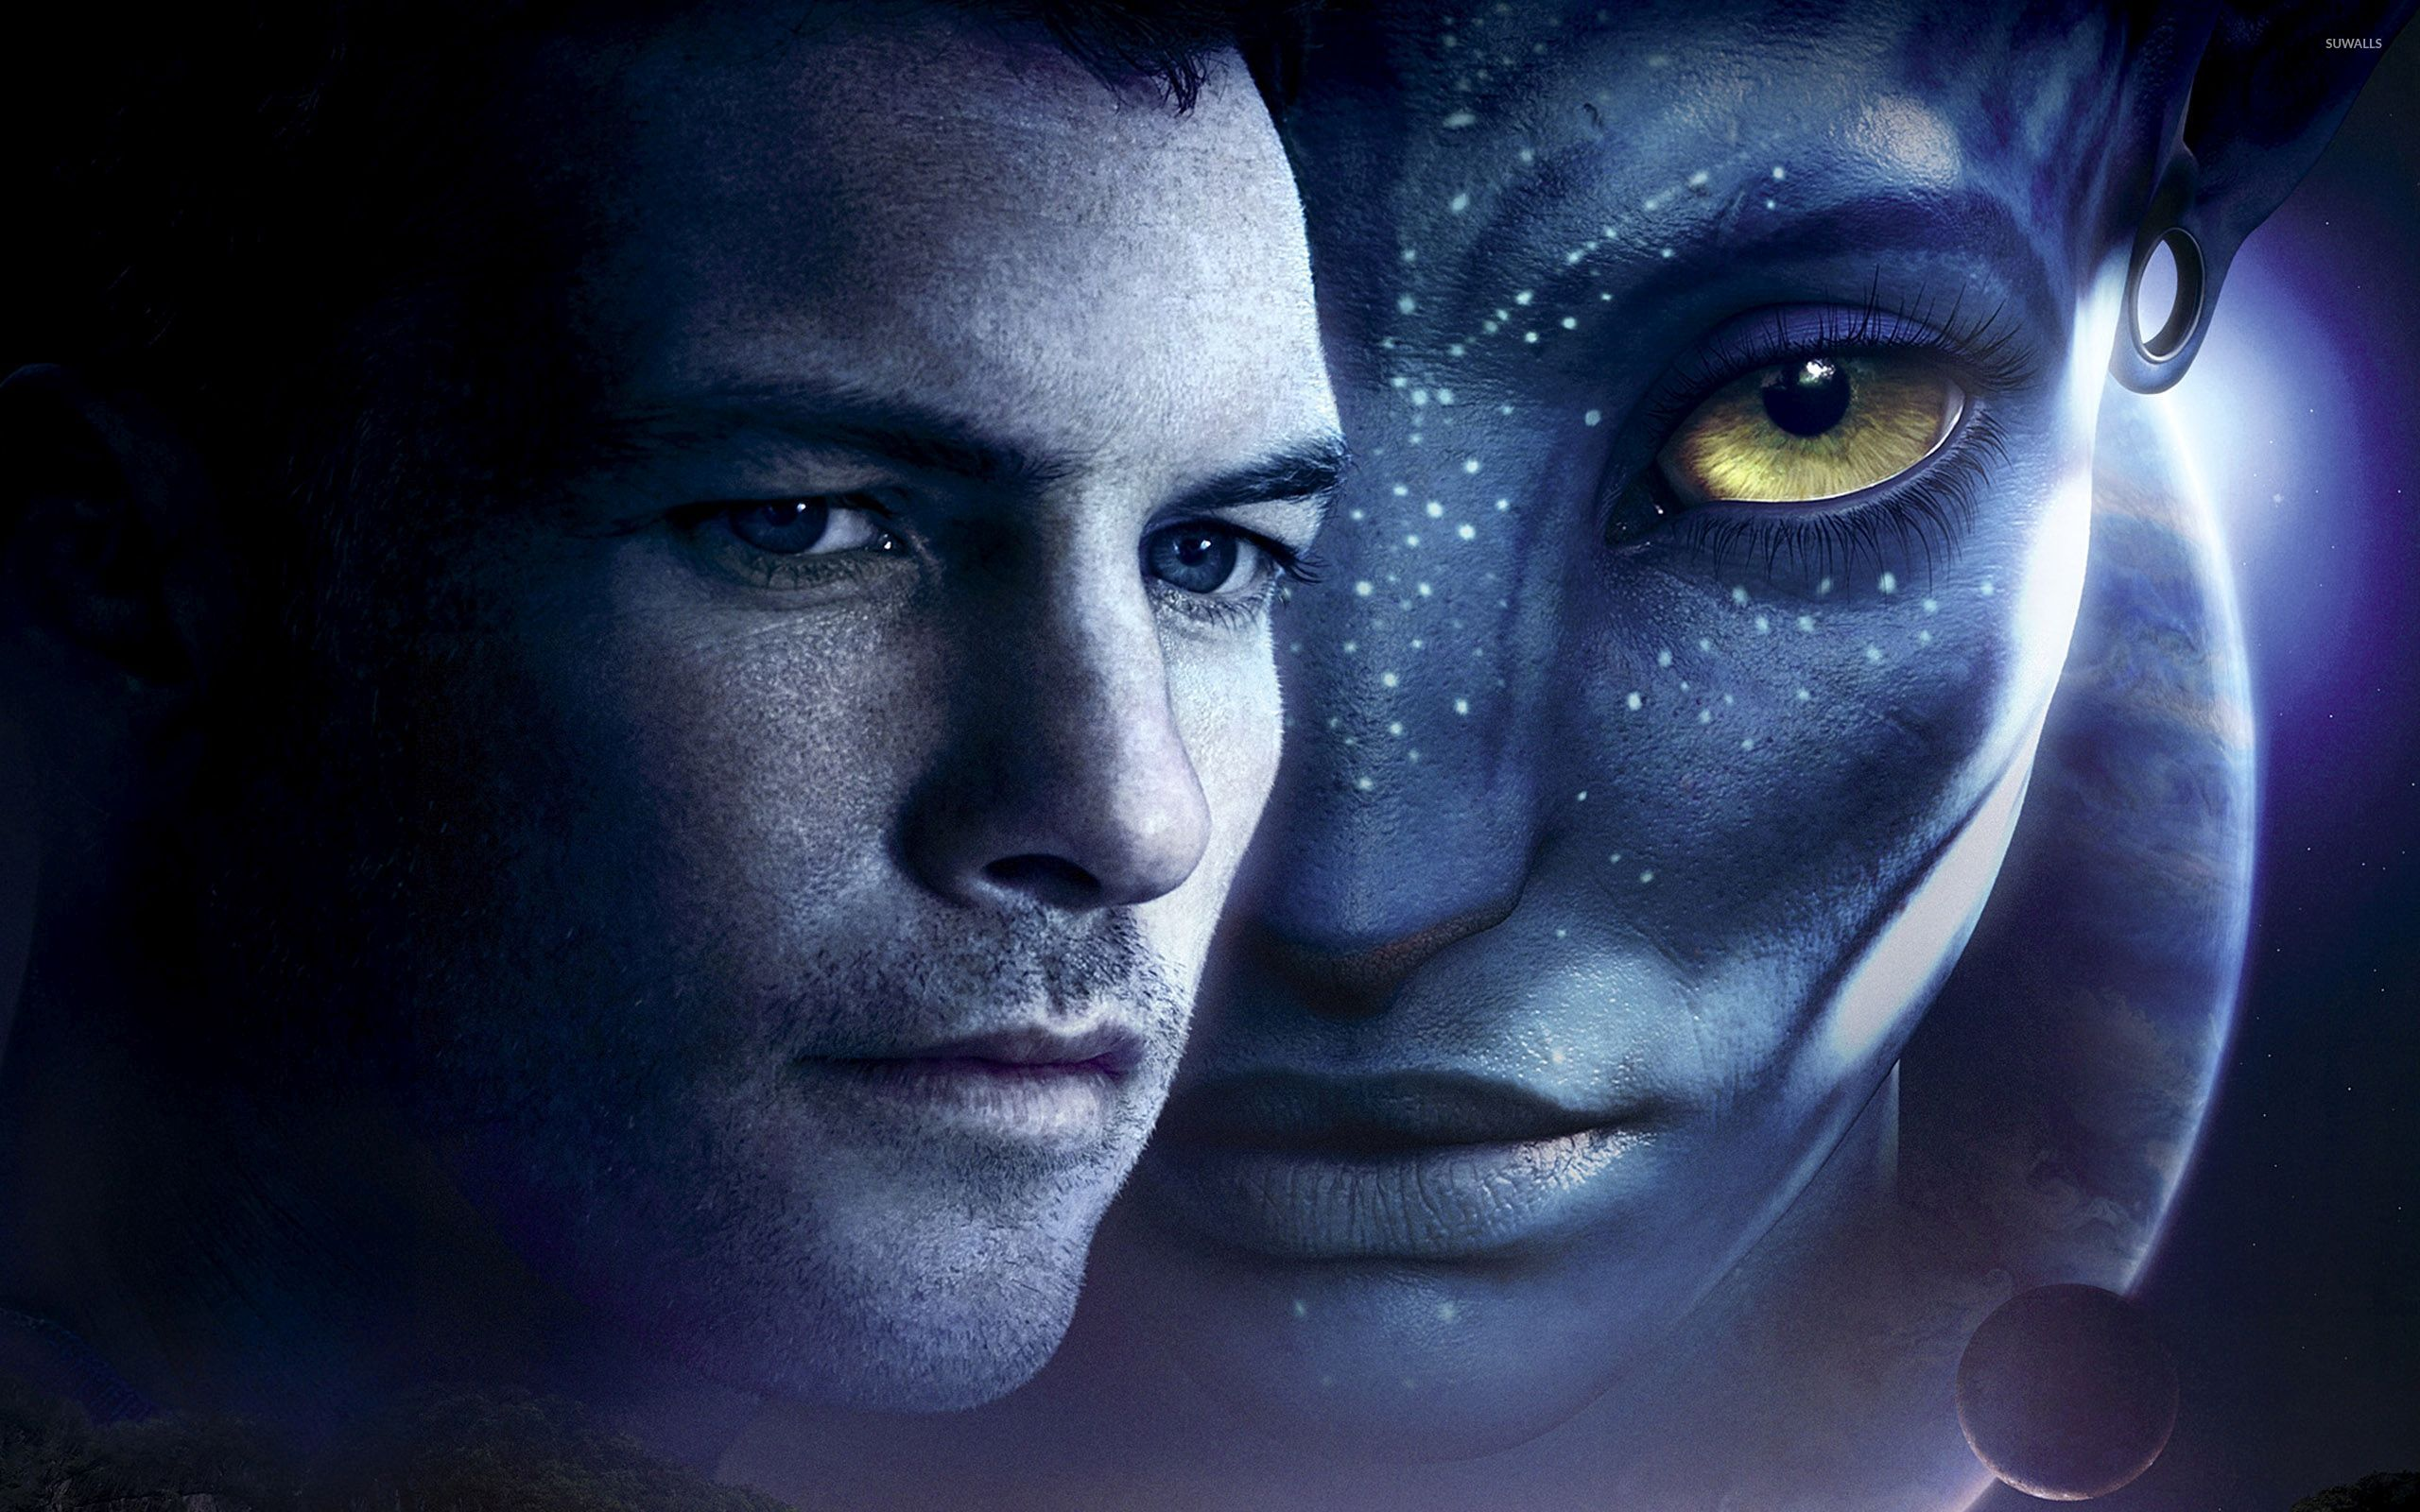 Must see Wallpaper Movie Avatar 2 - avatar-36126-2560x1600  Image_646688.jpg